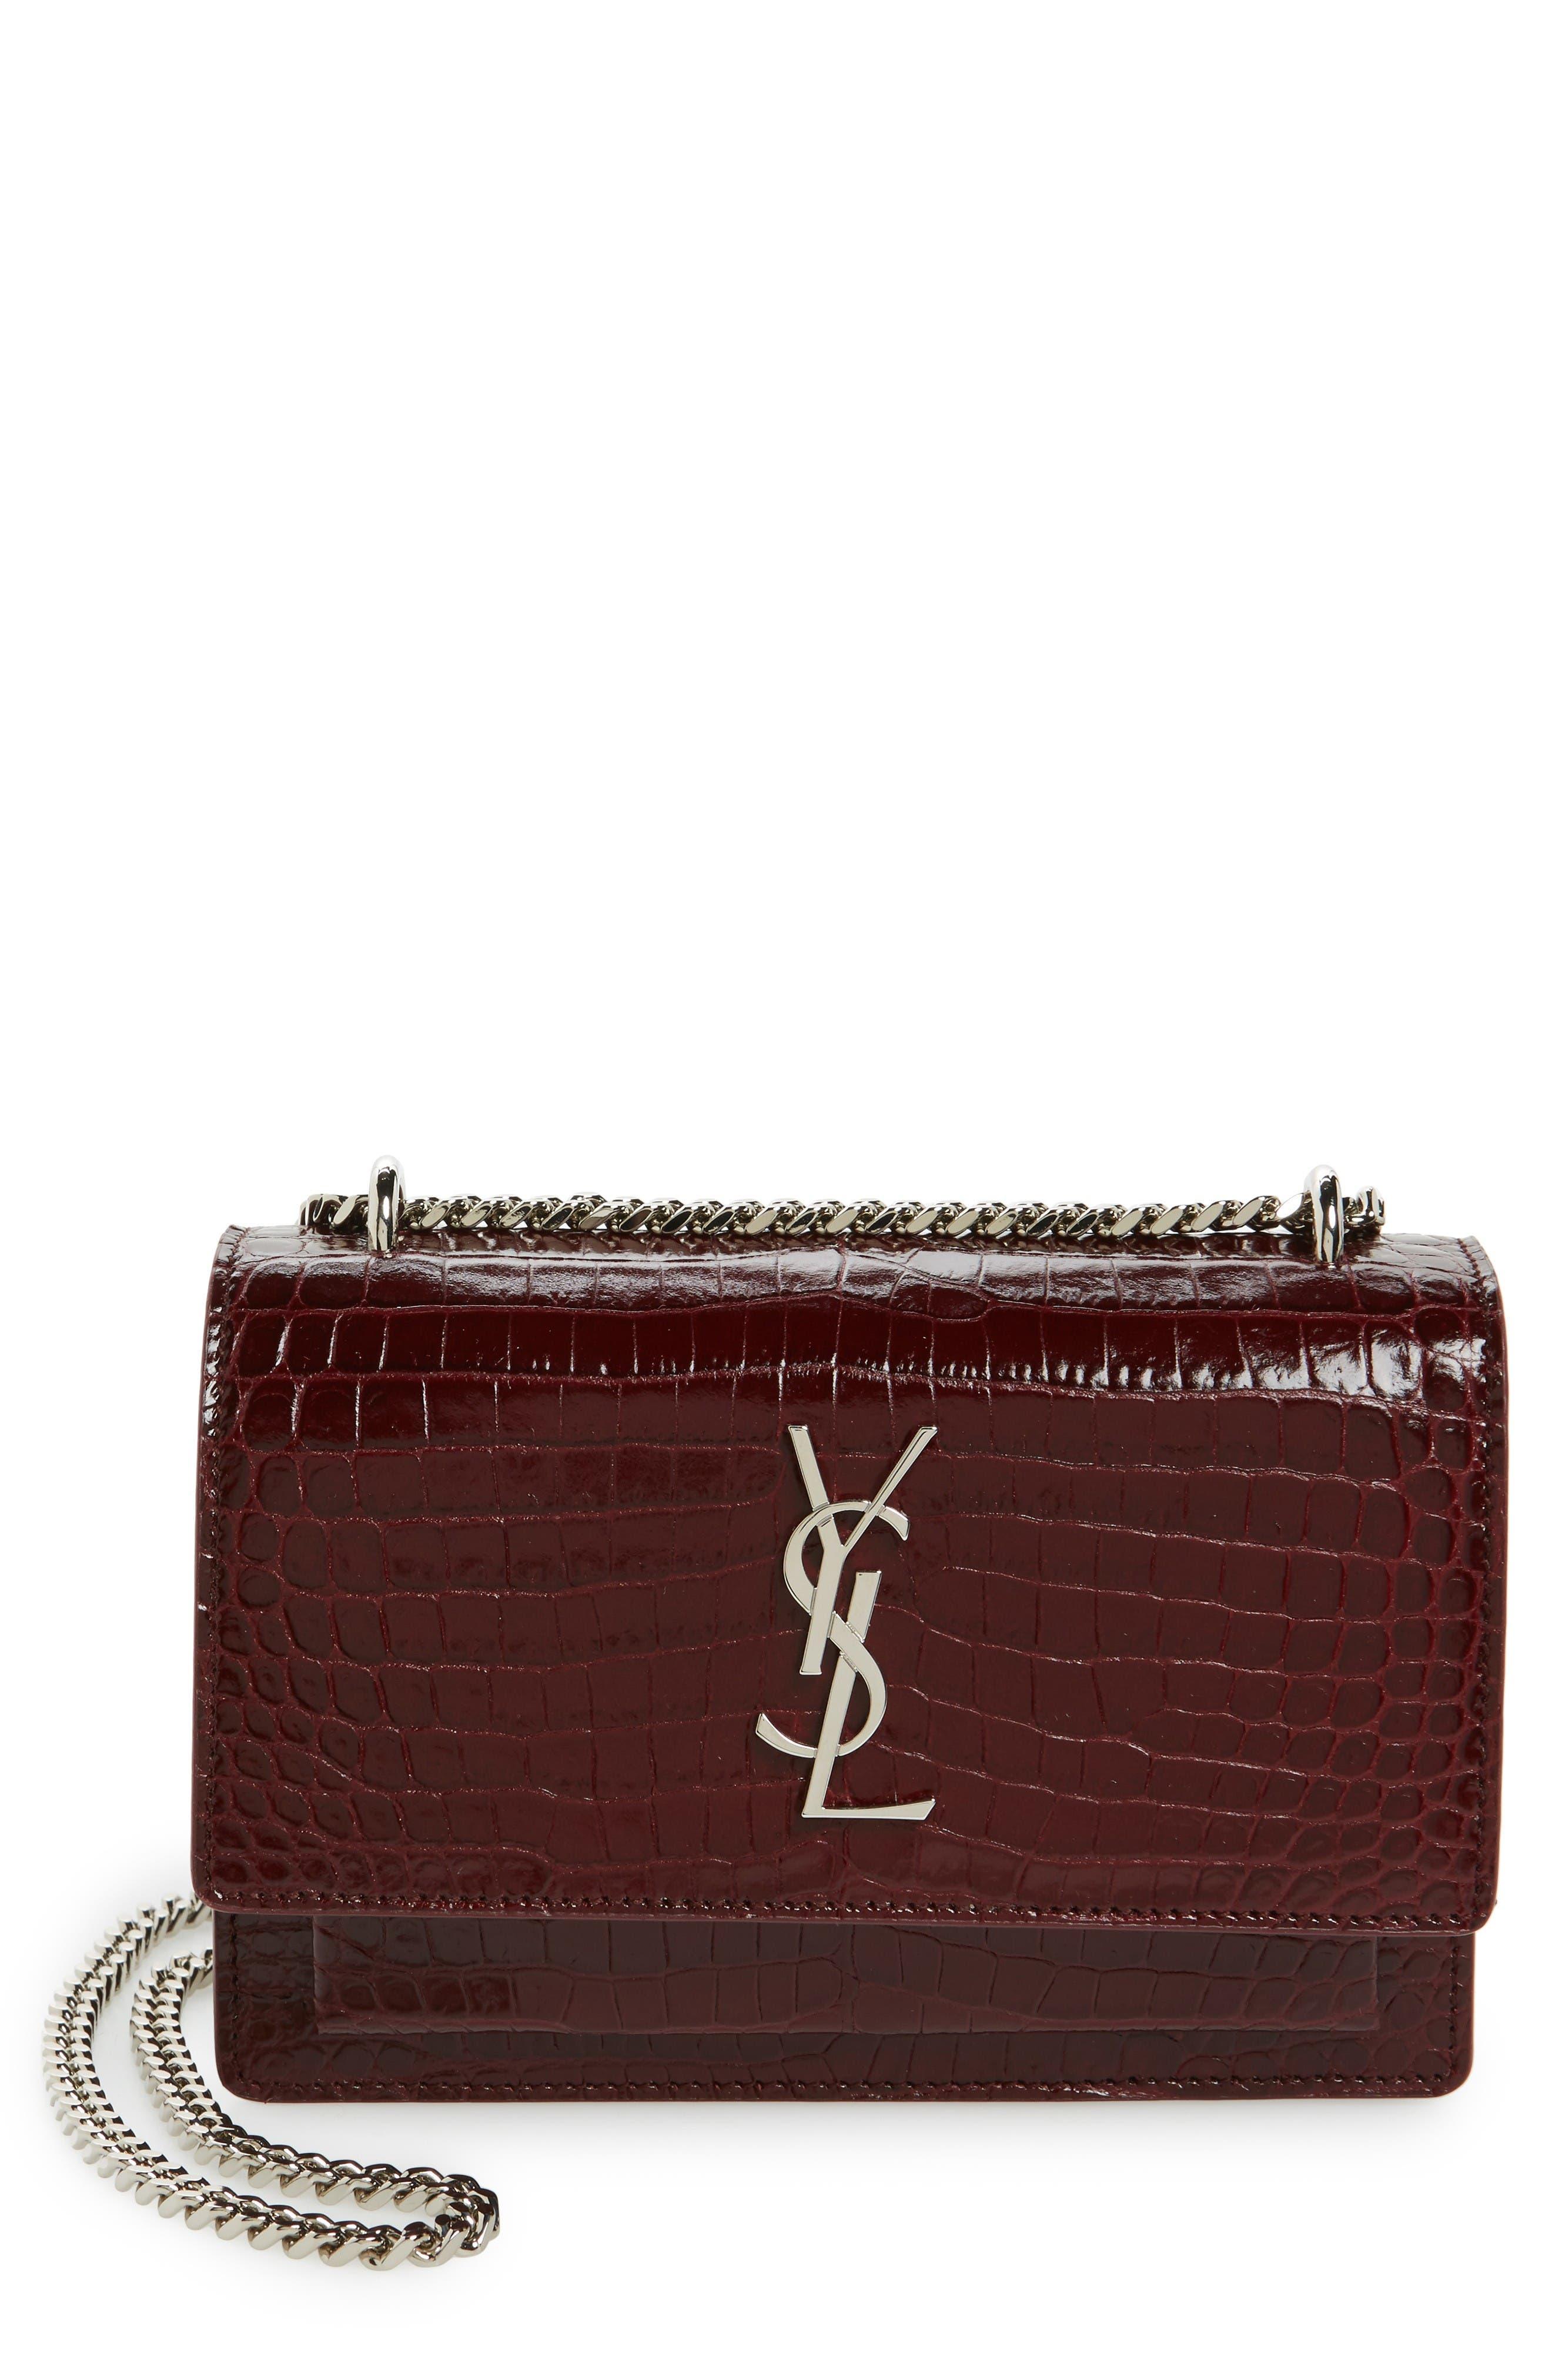 Alternate Image 1 Selected - Saint Laurent Mini Monogram Sunset Croc Embossed Leather Shoulder Bag